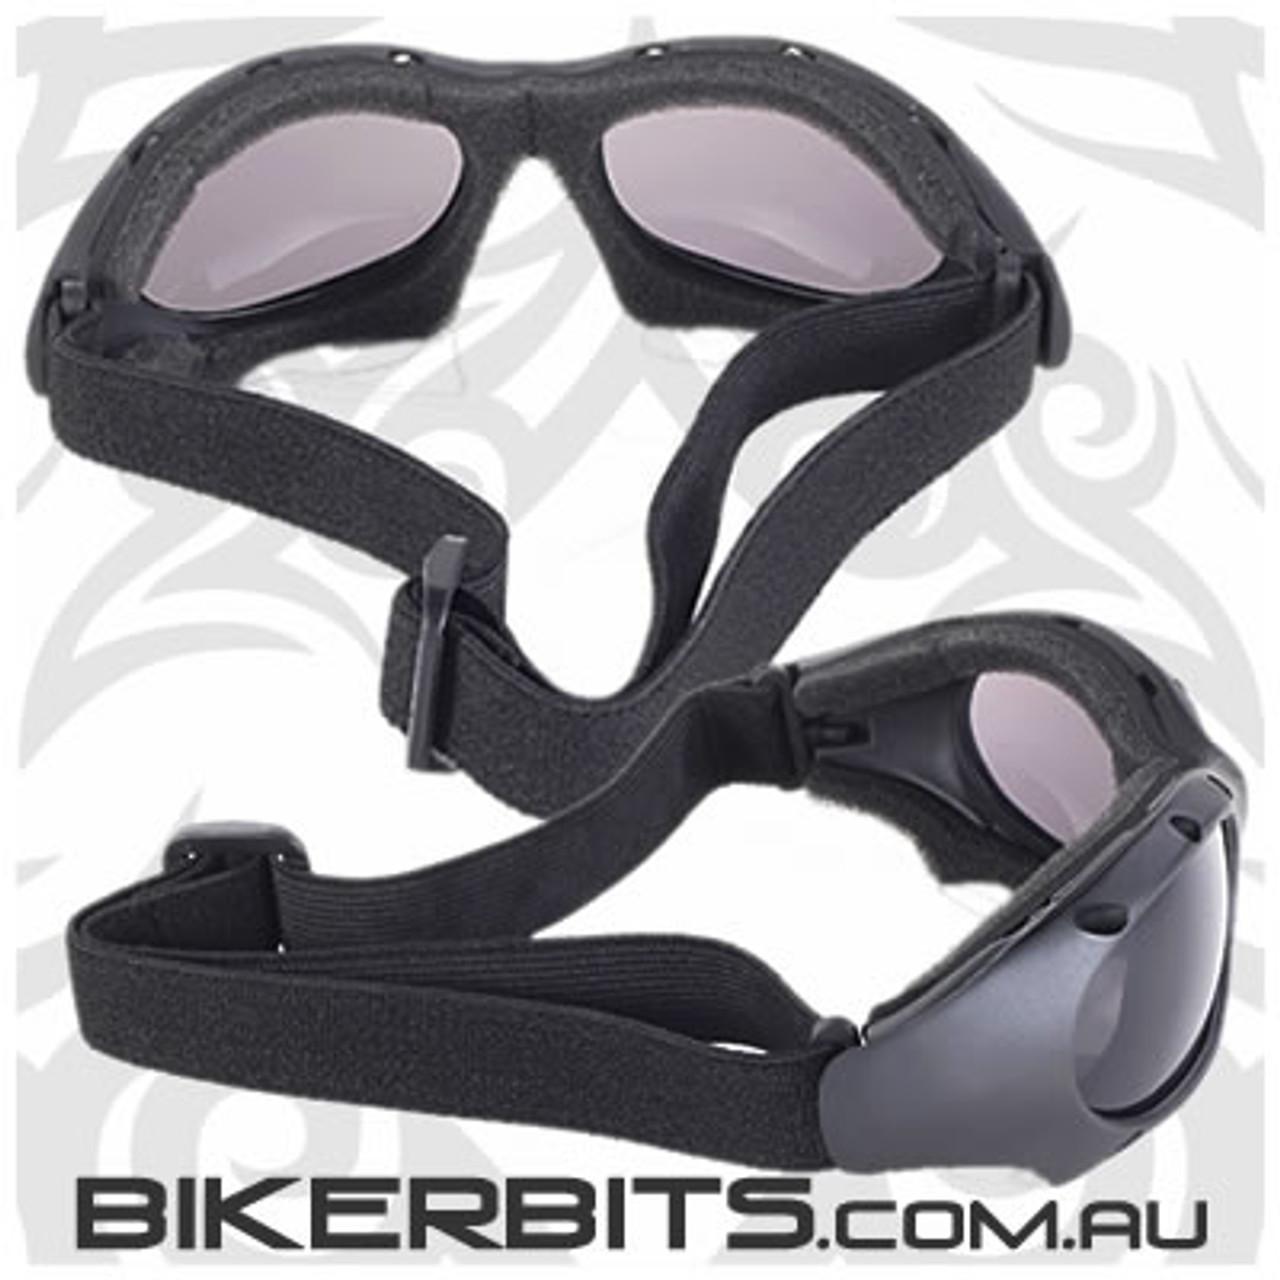 Motorcycle Goggles - Kickstart Dominator - Smoke/Black